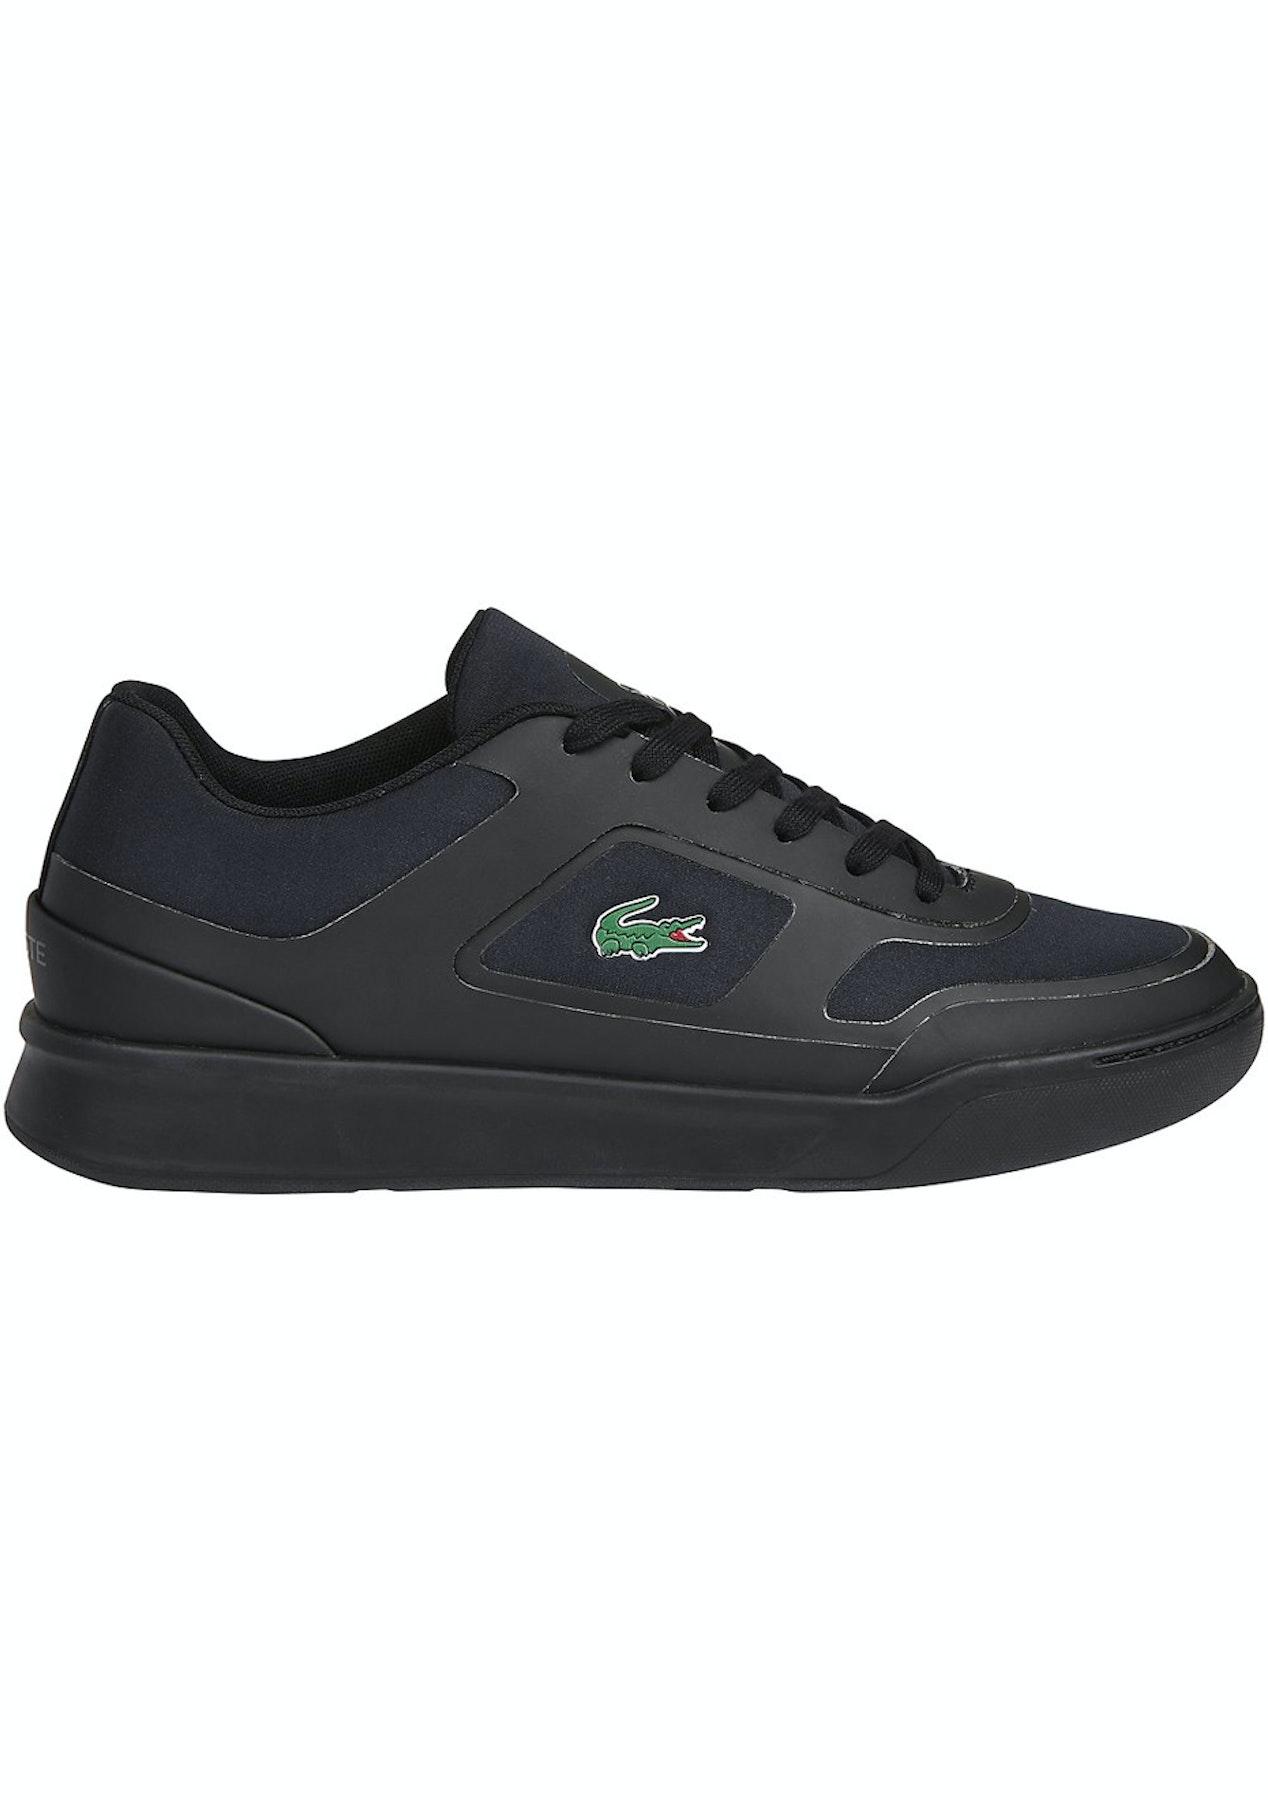 b2c5ff0f3 Mens Lacoste - Explorateur Sport 316 1 - Black - Free Shipping Mens Shoes -  Onceit